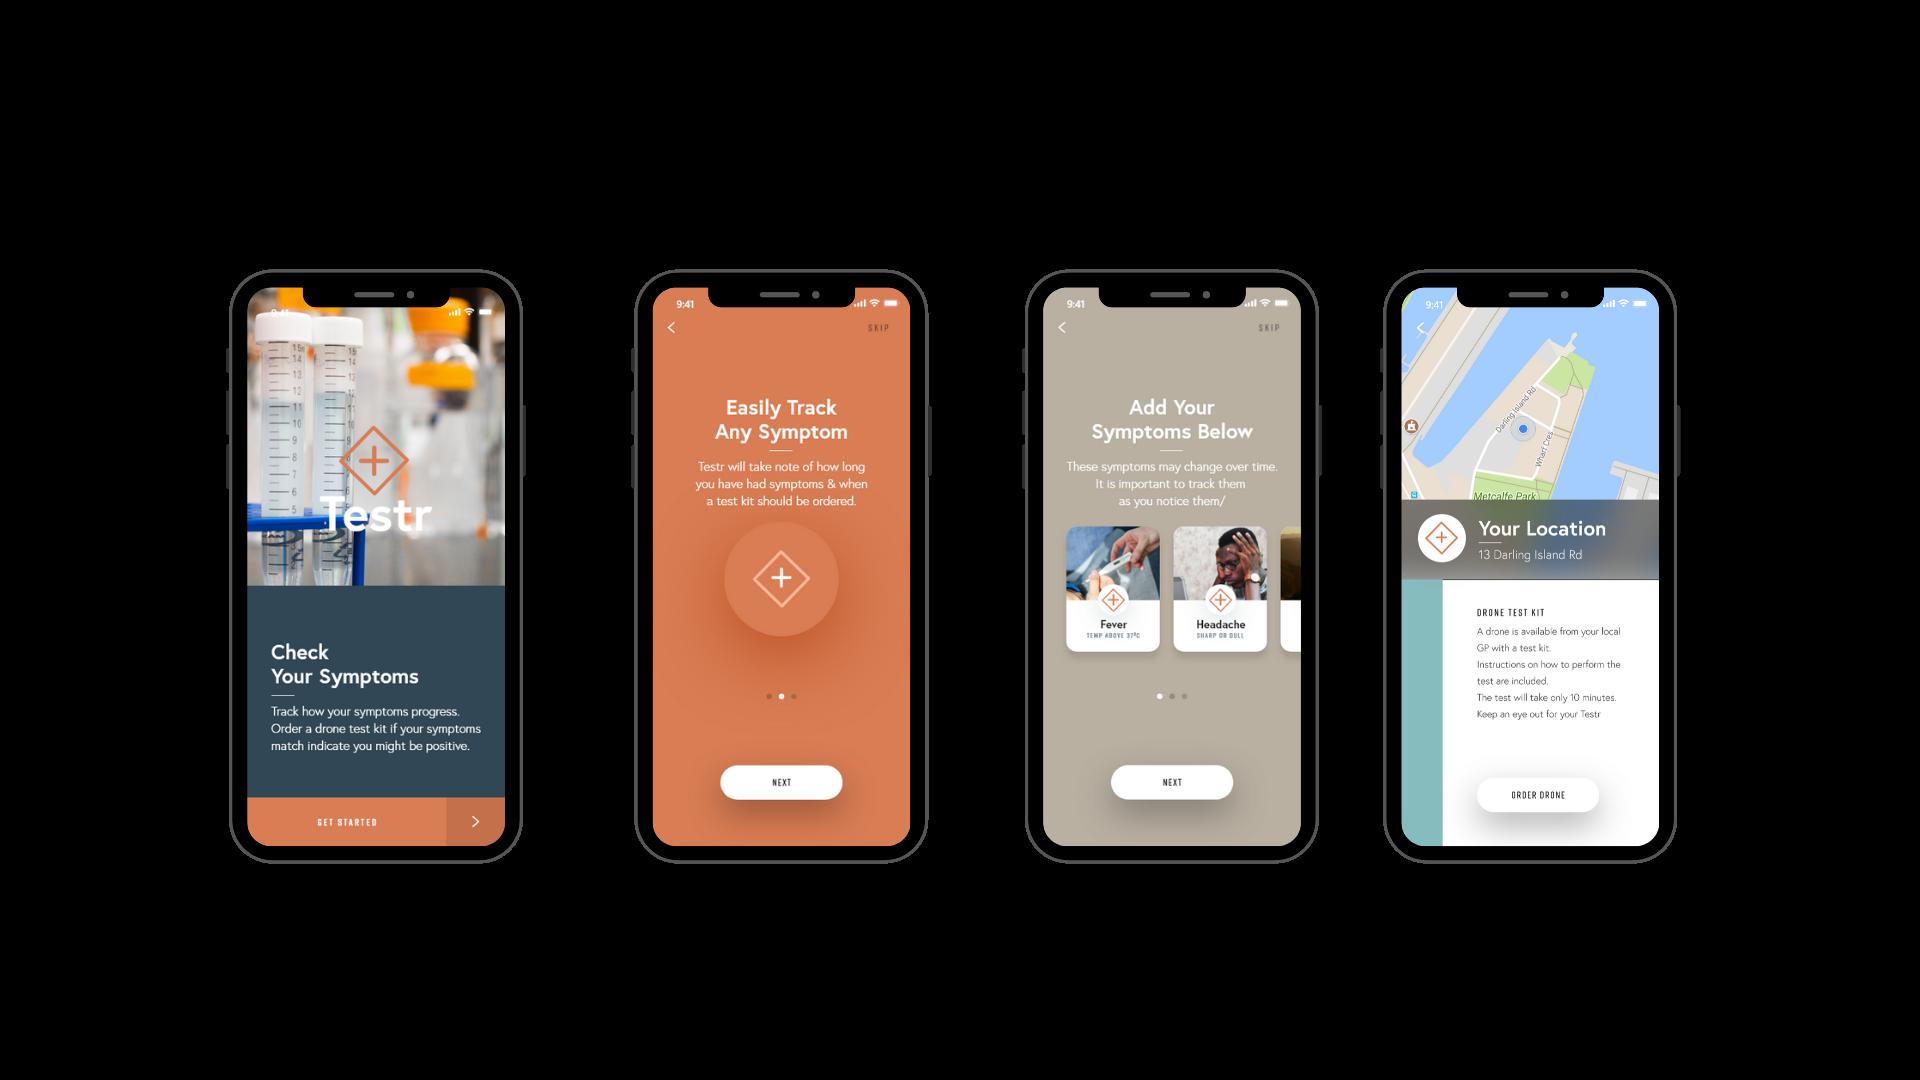 Testr: The Symptom Tracker App & Home Test Kit